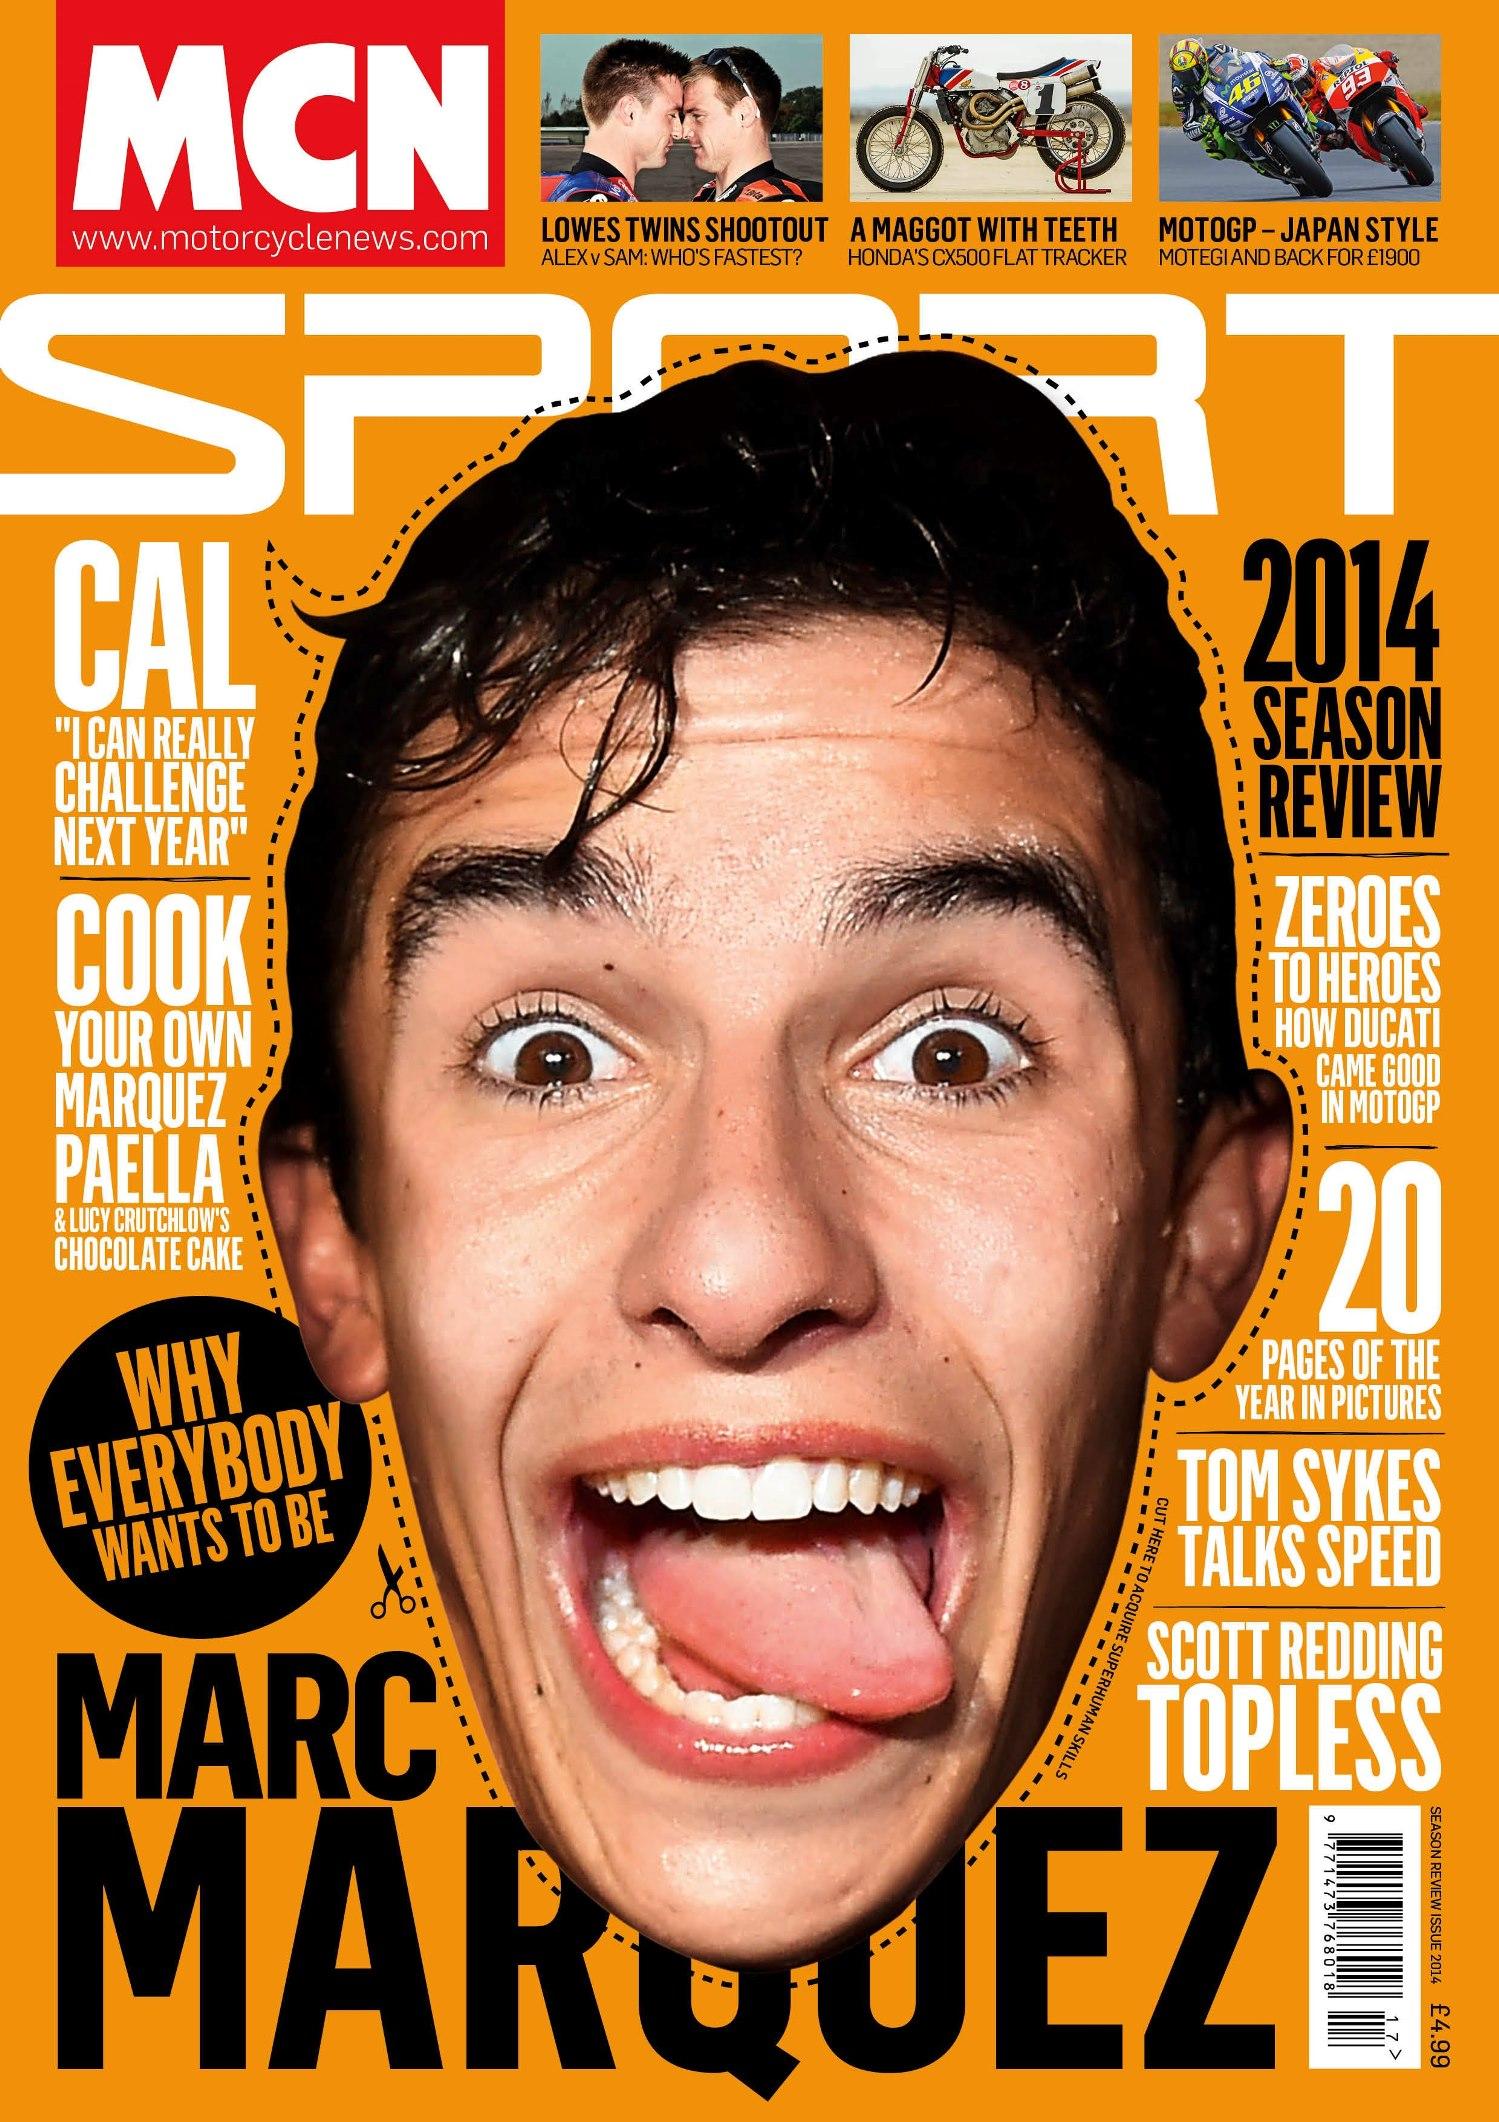 MCN Sport Season Review 2014